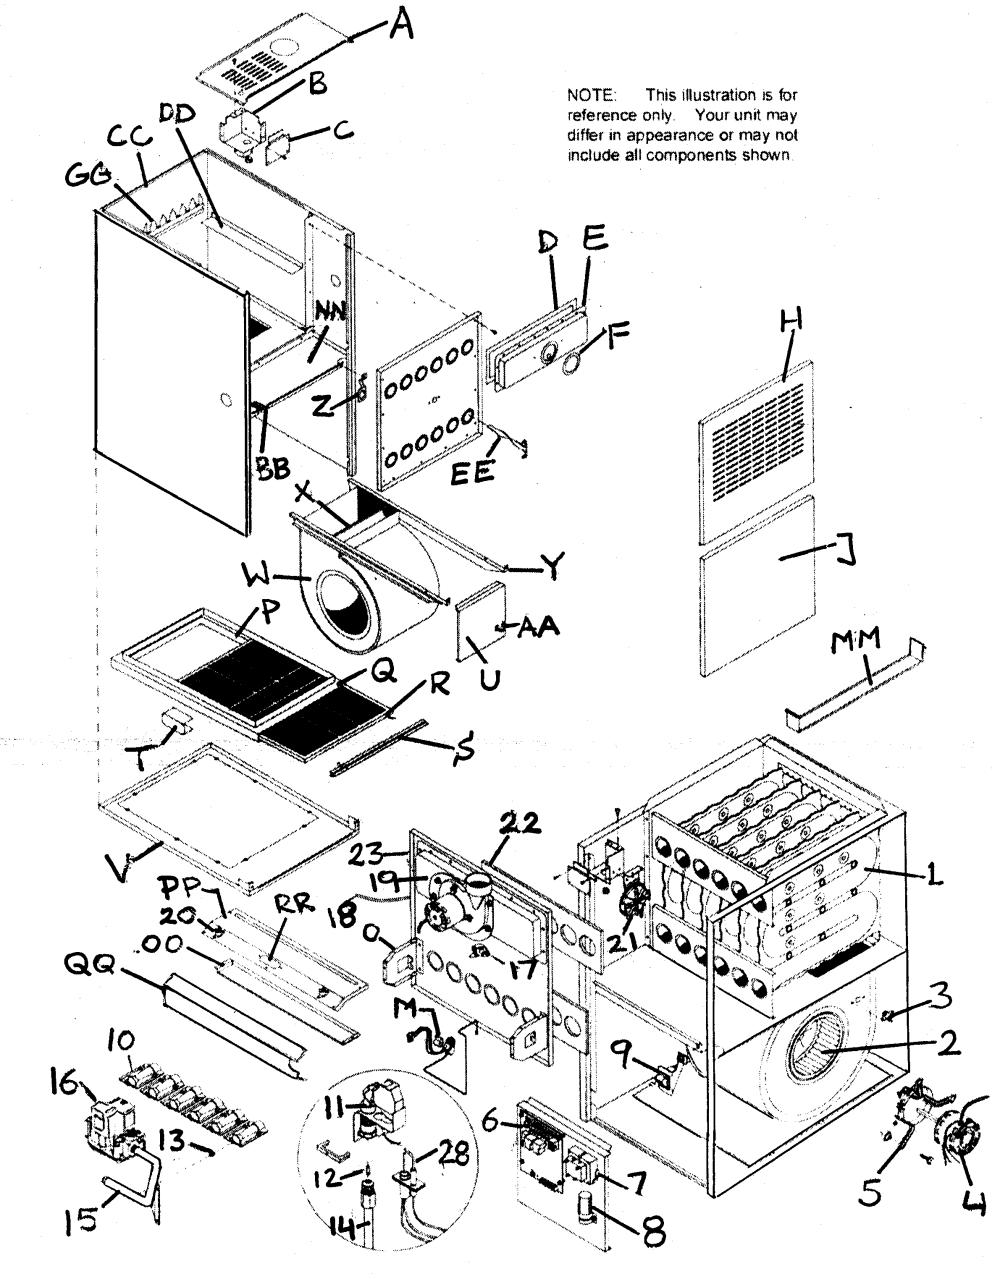 medium resolution of trane furnace schematics online manuual of wiring diagram trane furnace parts saskatoon c searspartsdirect com lis png